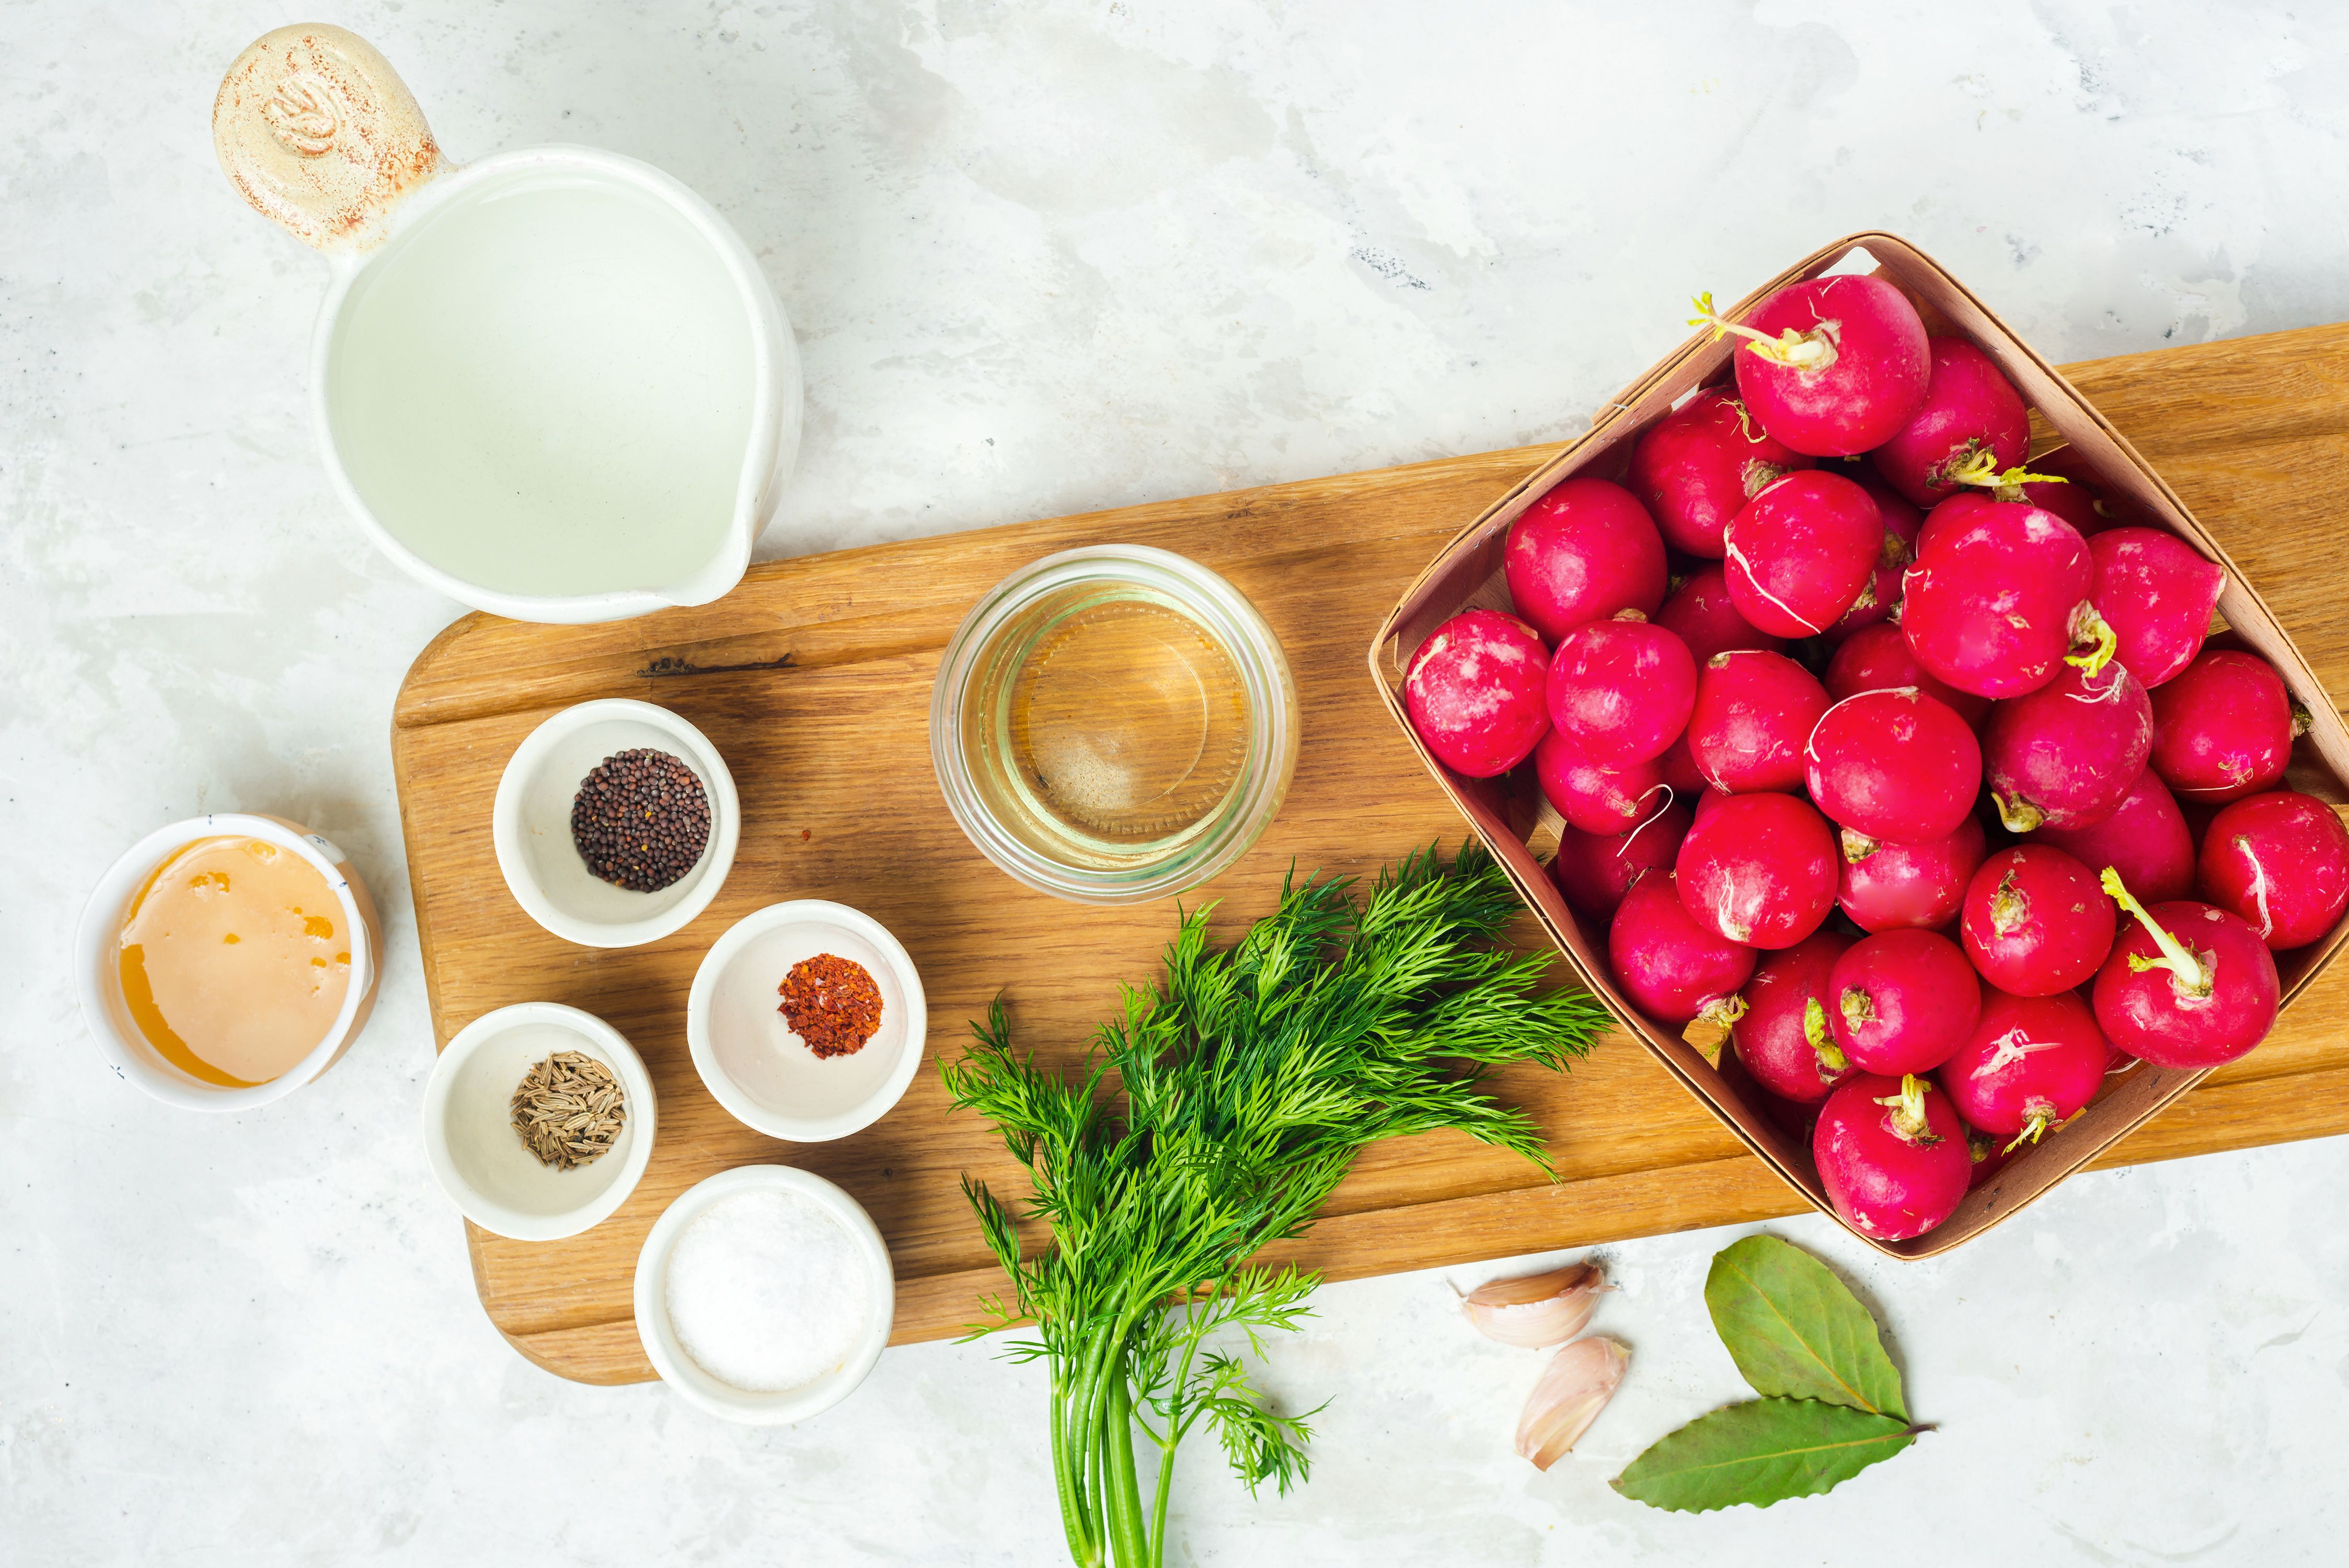 Ingredients for pickled radish